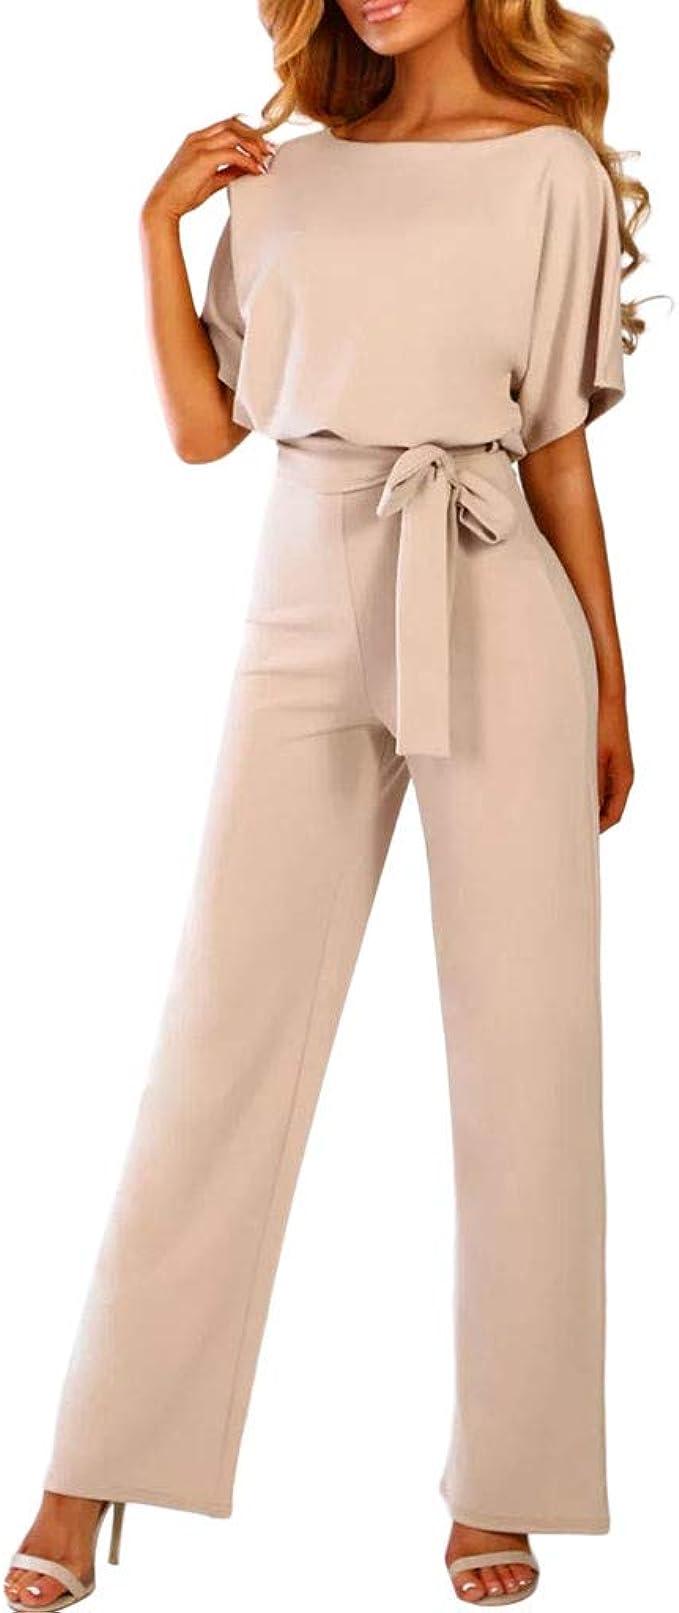 Fseason-Women Premium Colorful Round Neck Nightclub Romper Jumpsuit Pants